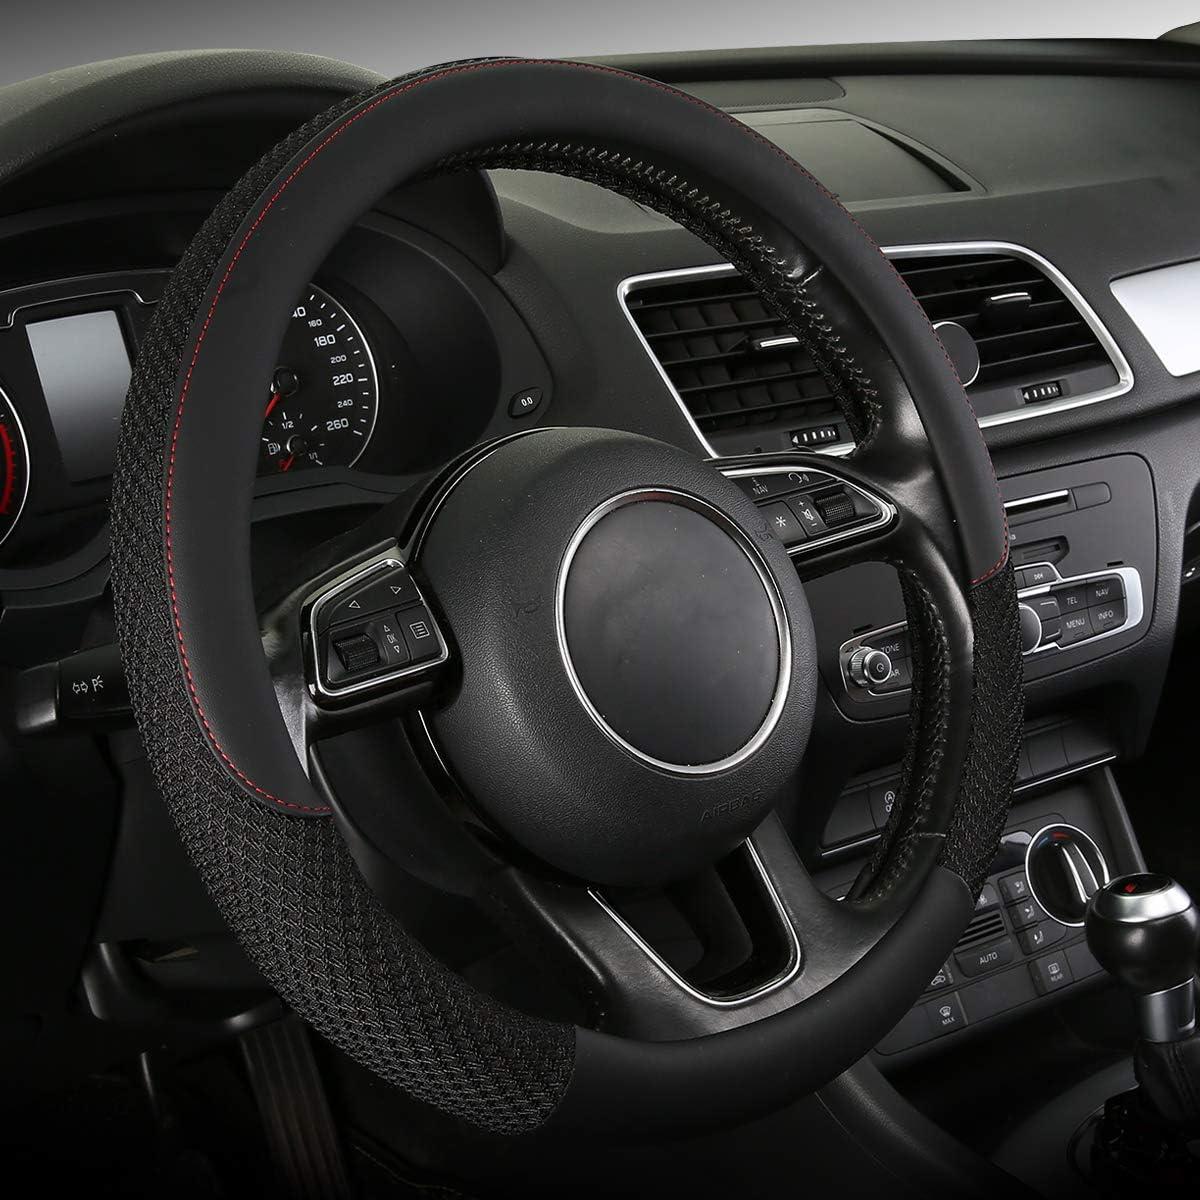 SWC-Bling SOBONITO Bling Bling Steering Wheel Cover-Crystal Diamond for Women,Car Interior Decor,Universal 15inch,Black